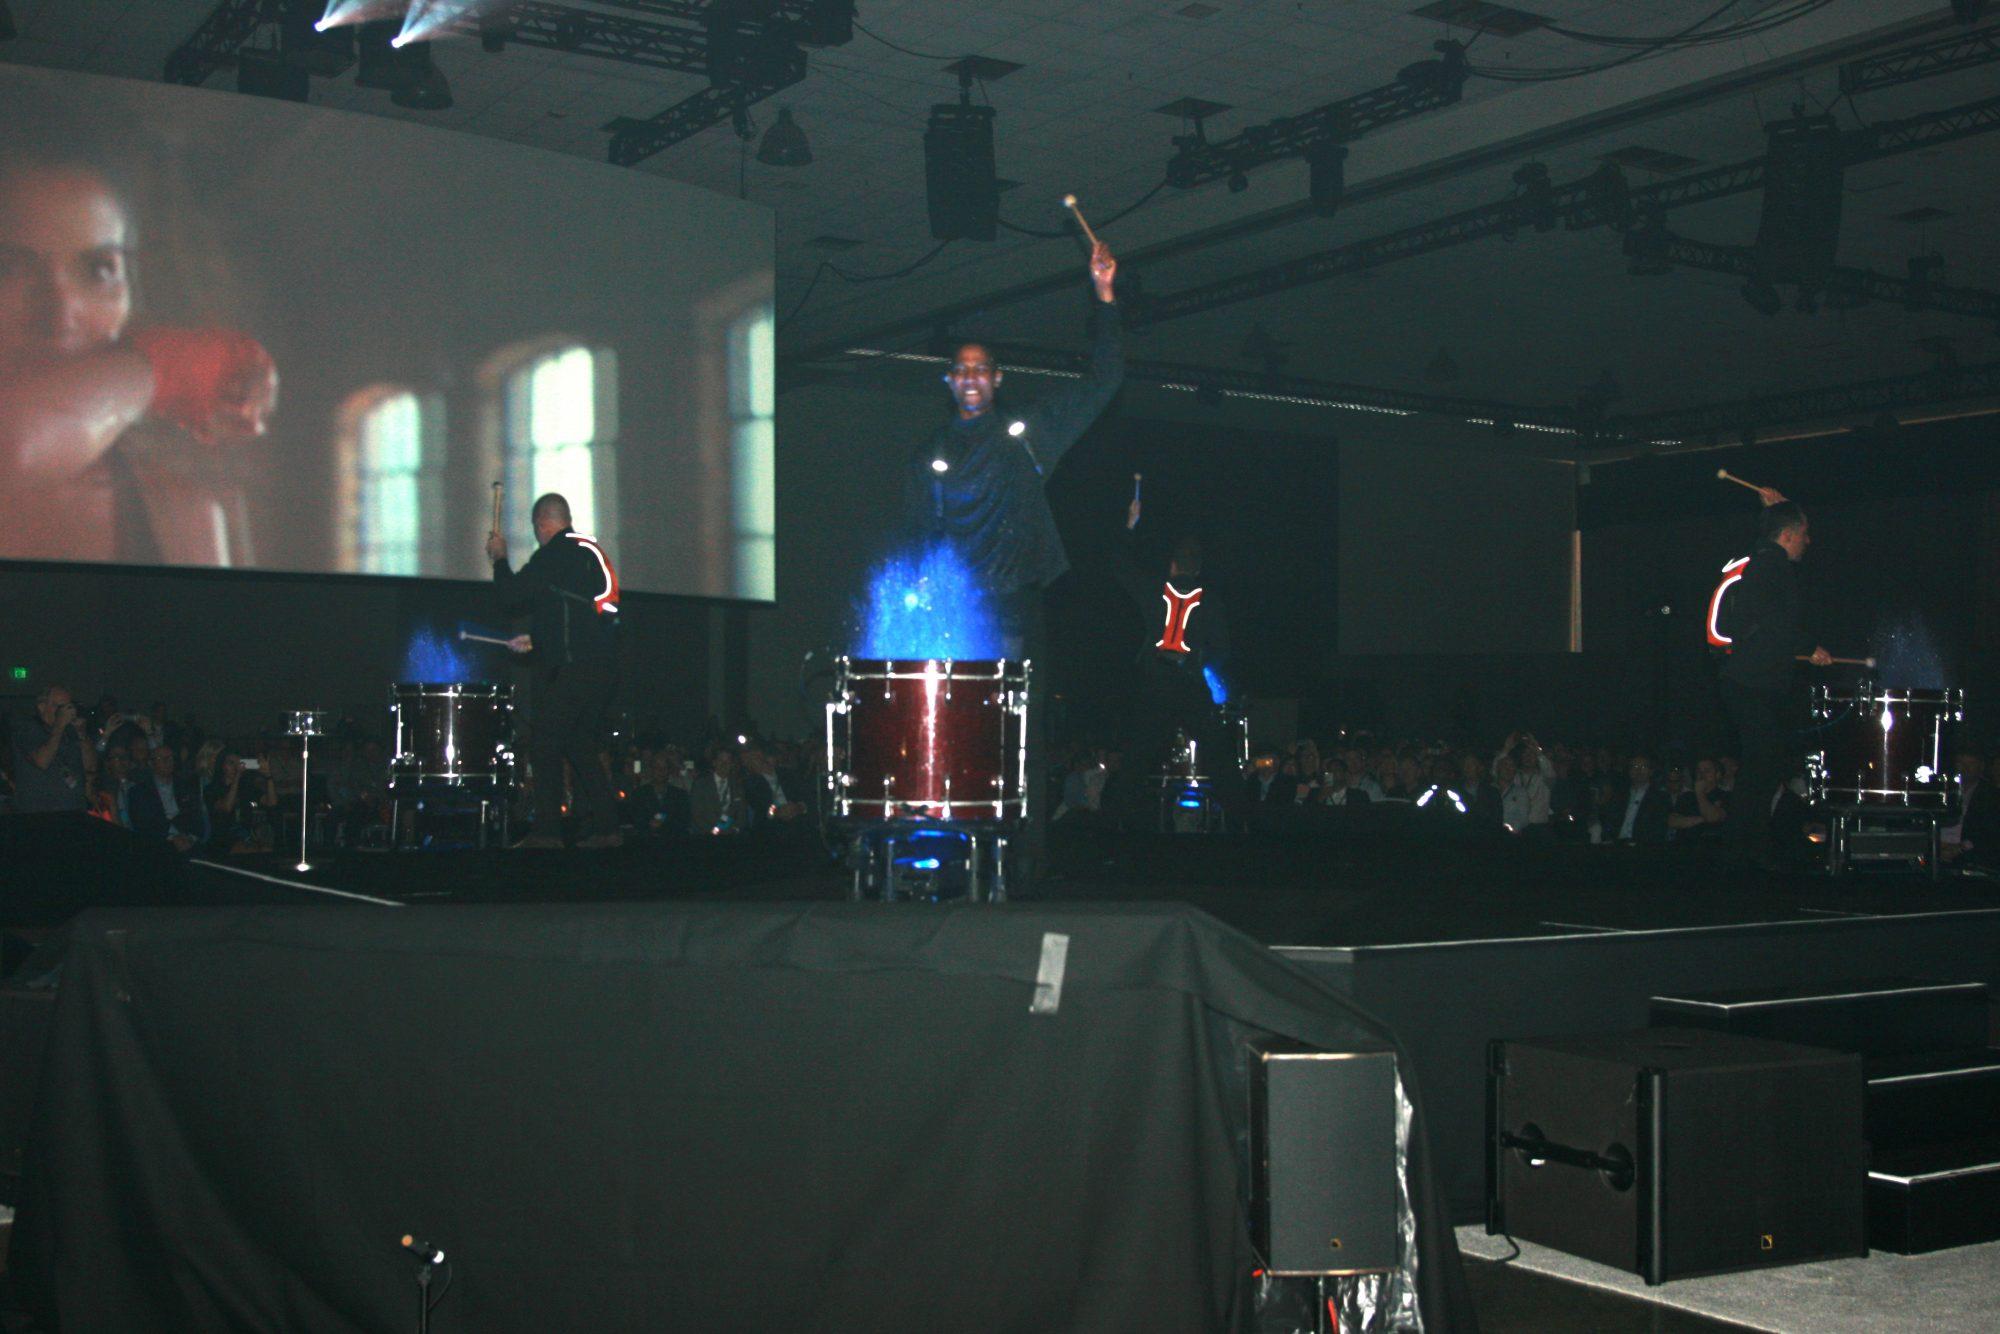 Slide 2 - Drummers